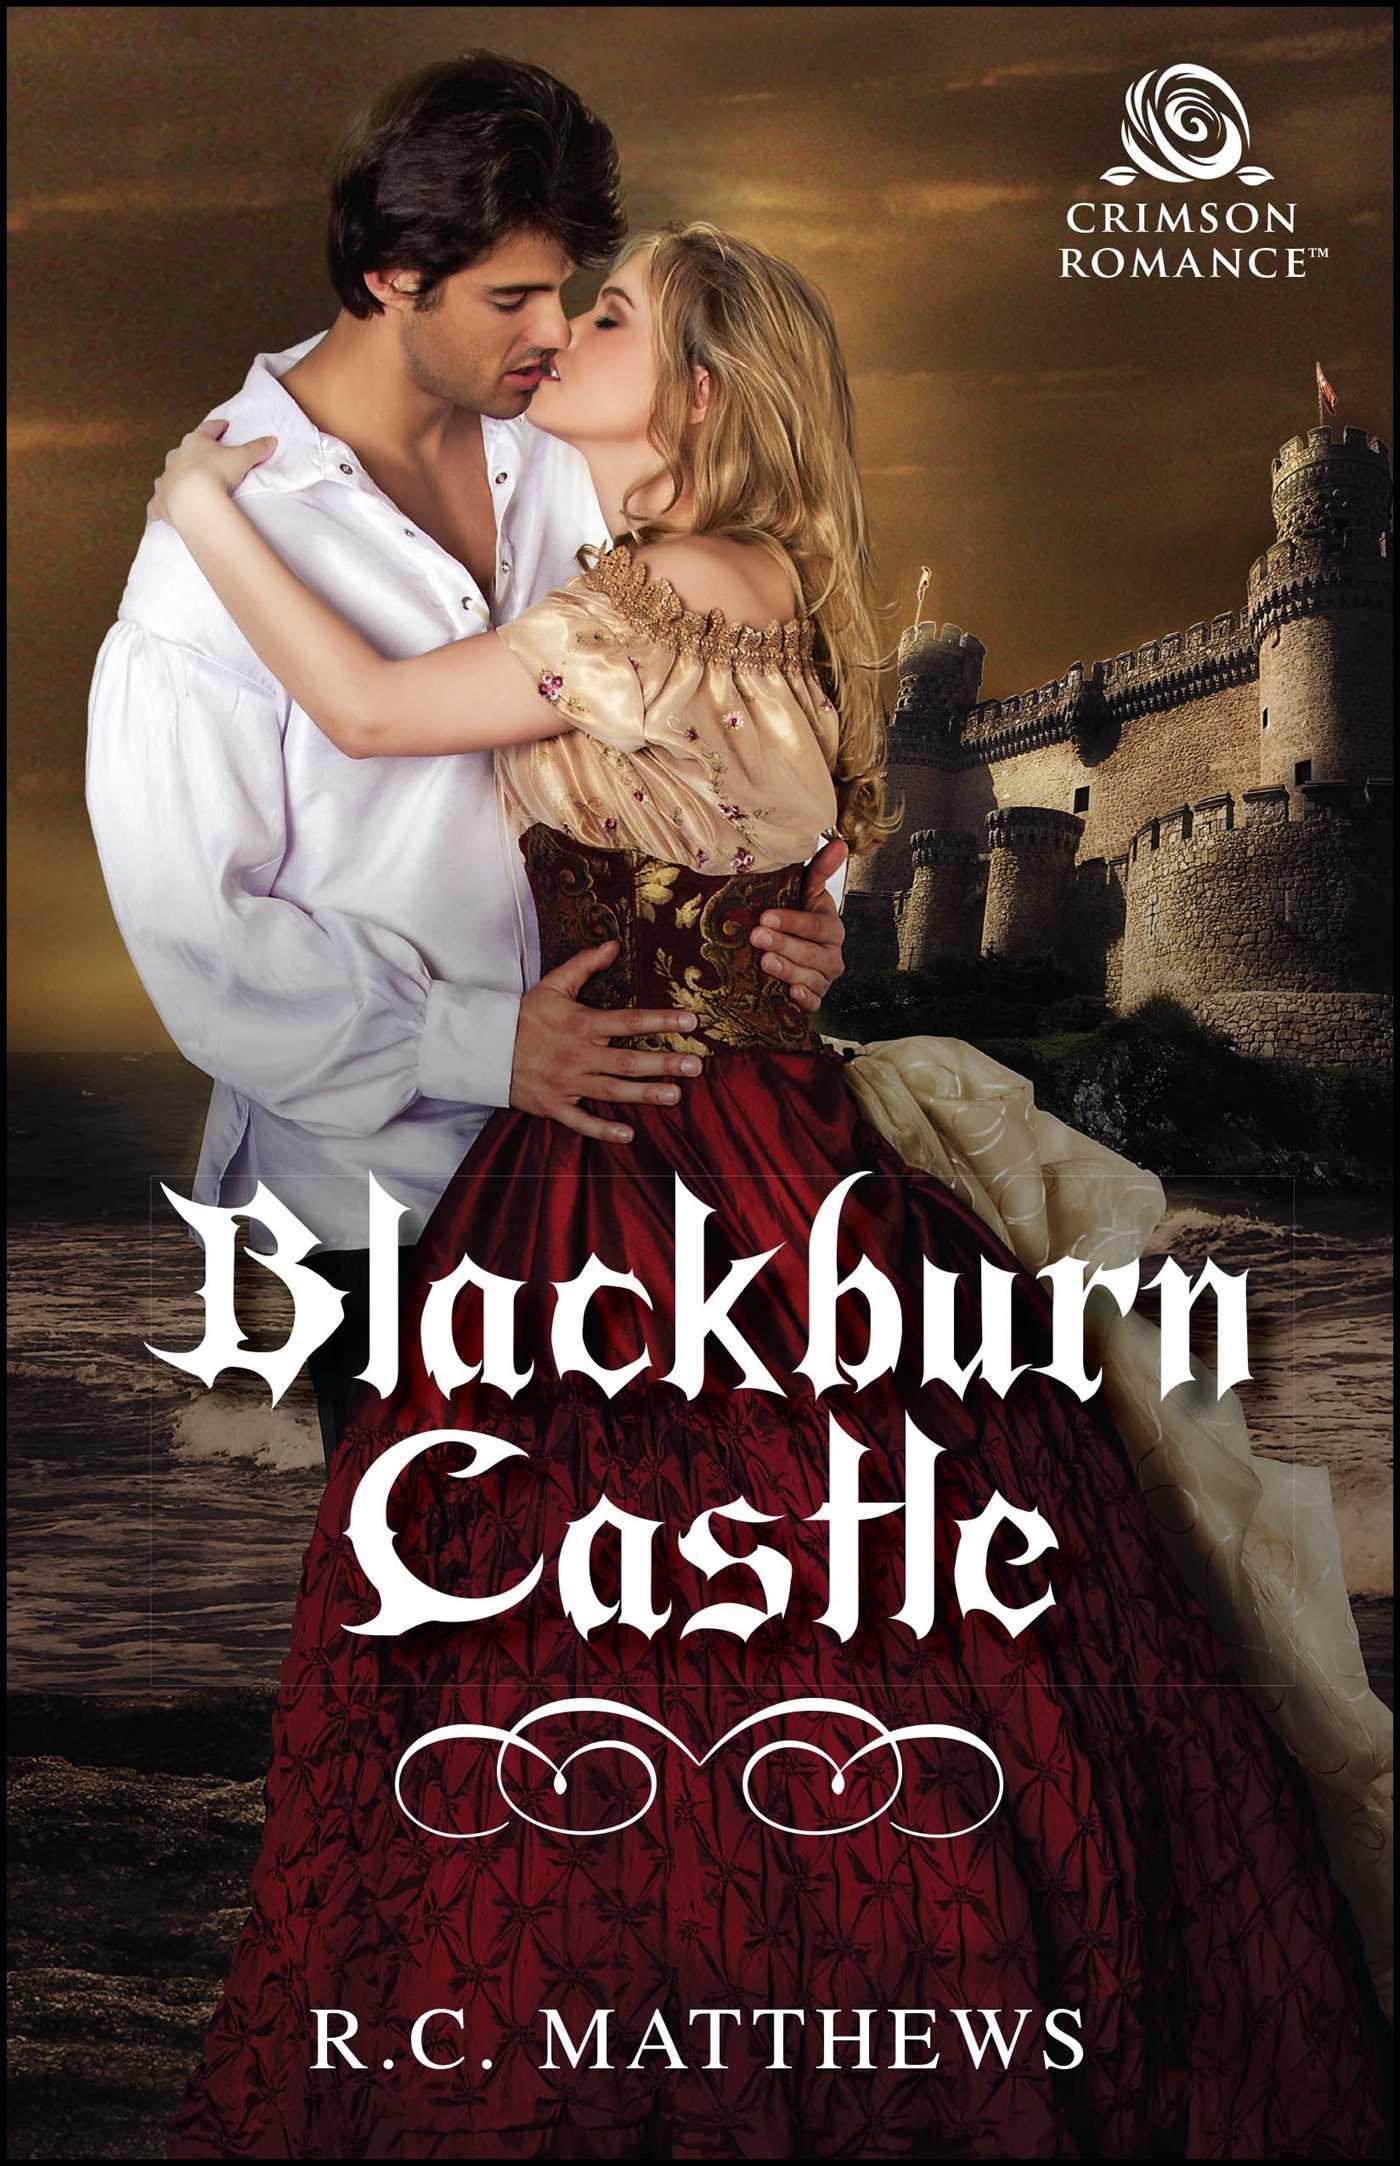 Blackburn castle 9781507206218 hr